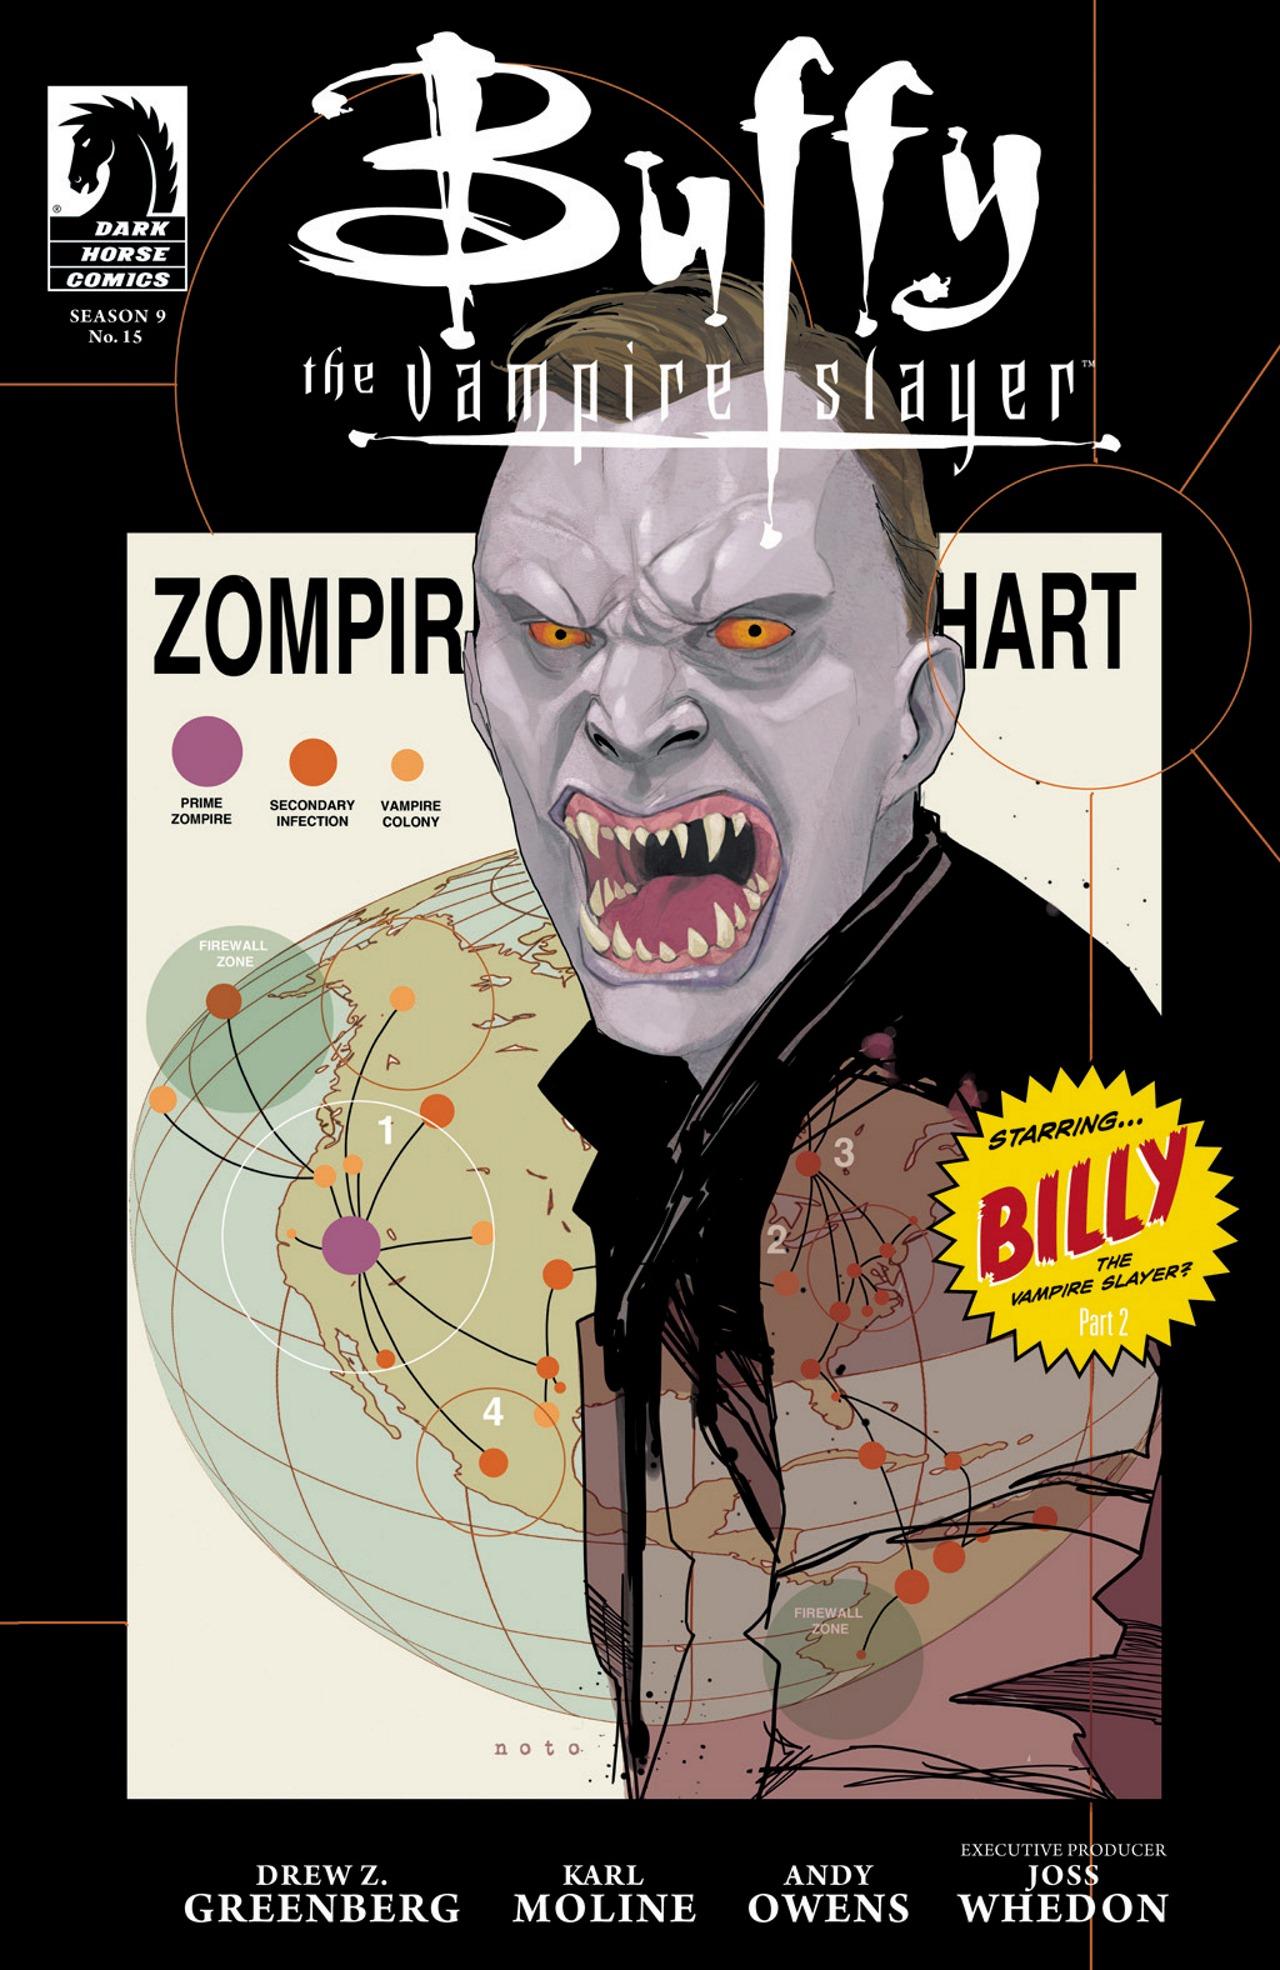 Buffy the Vampire Slayer Season Nine 15 Page 1